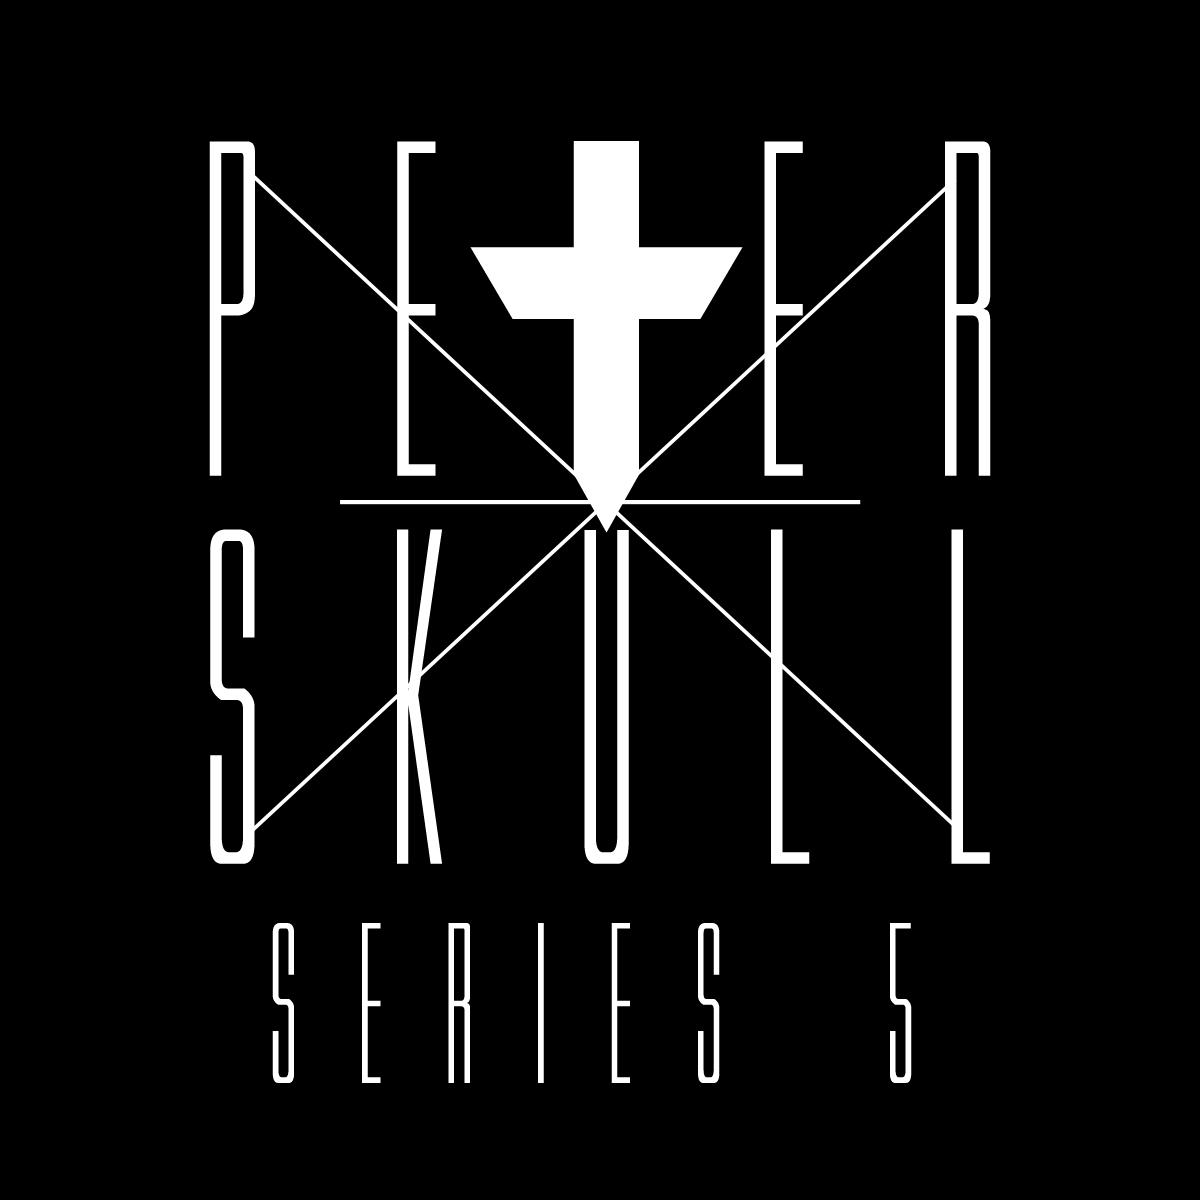 Series #5 - 0